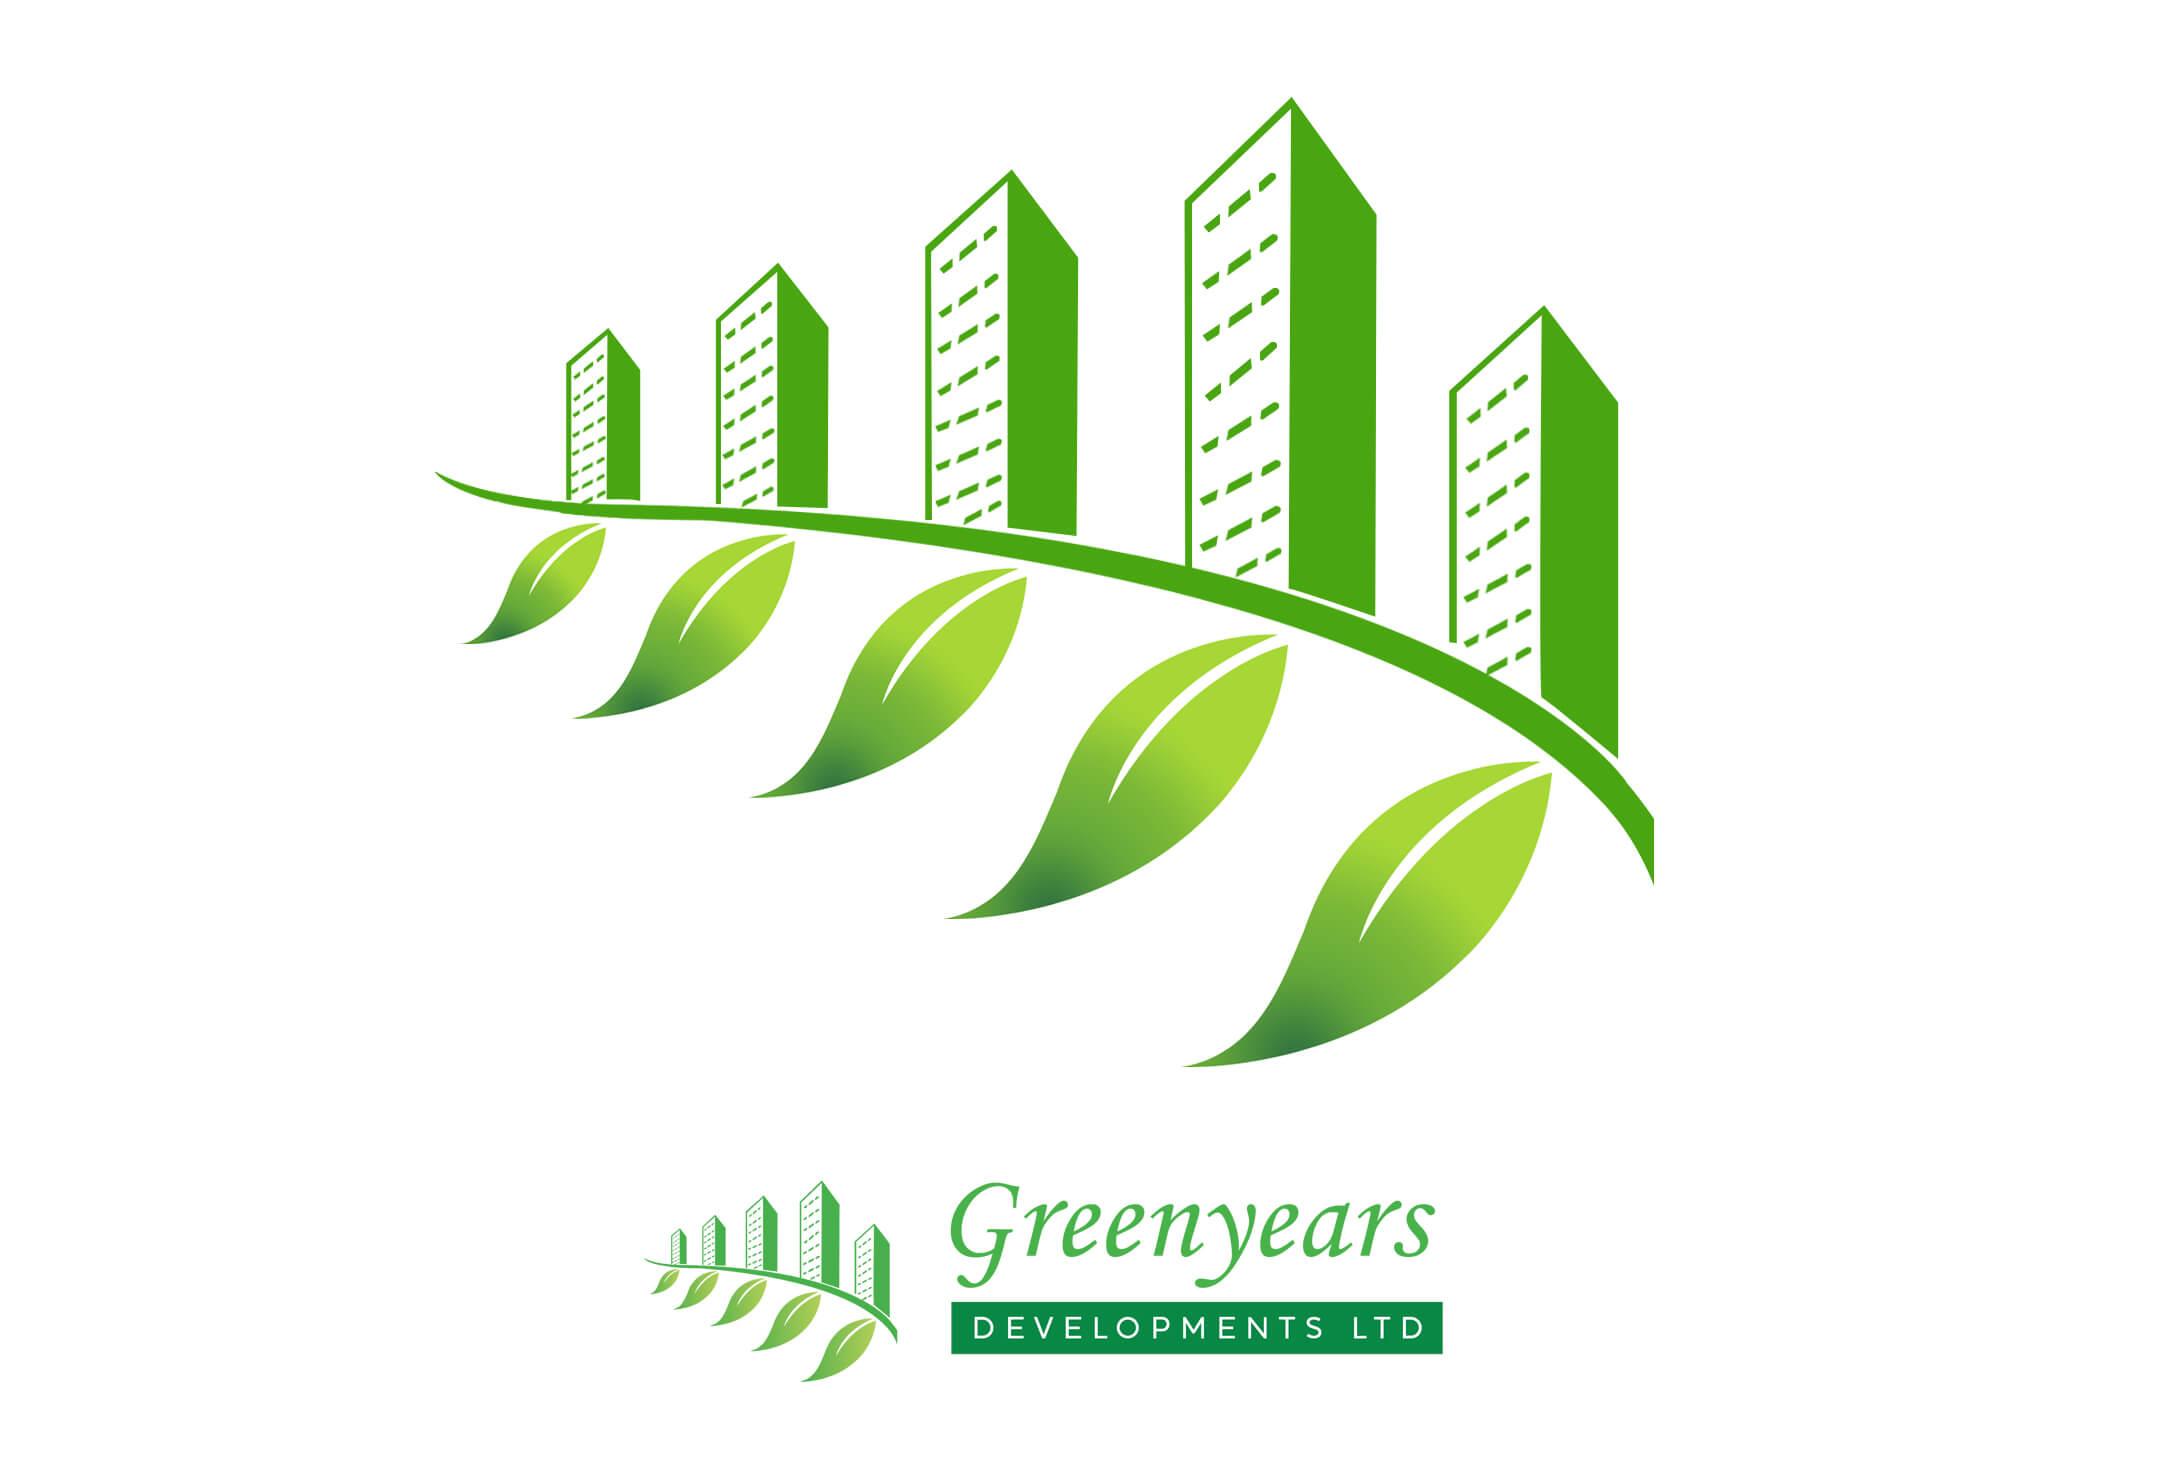 greenyears